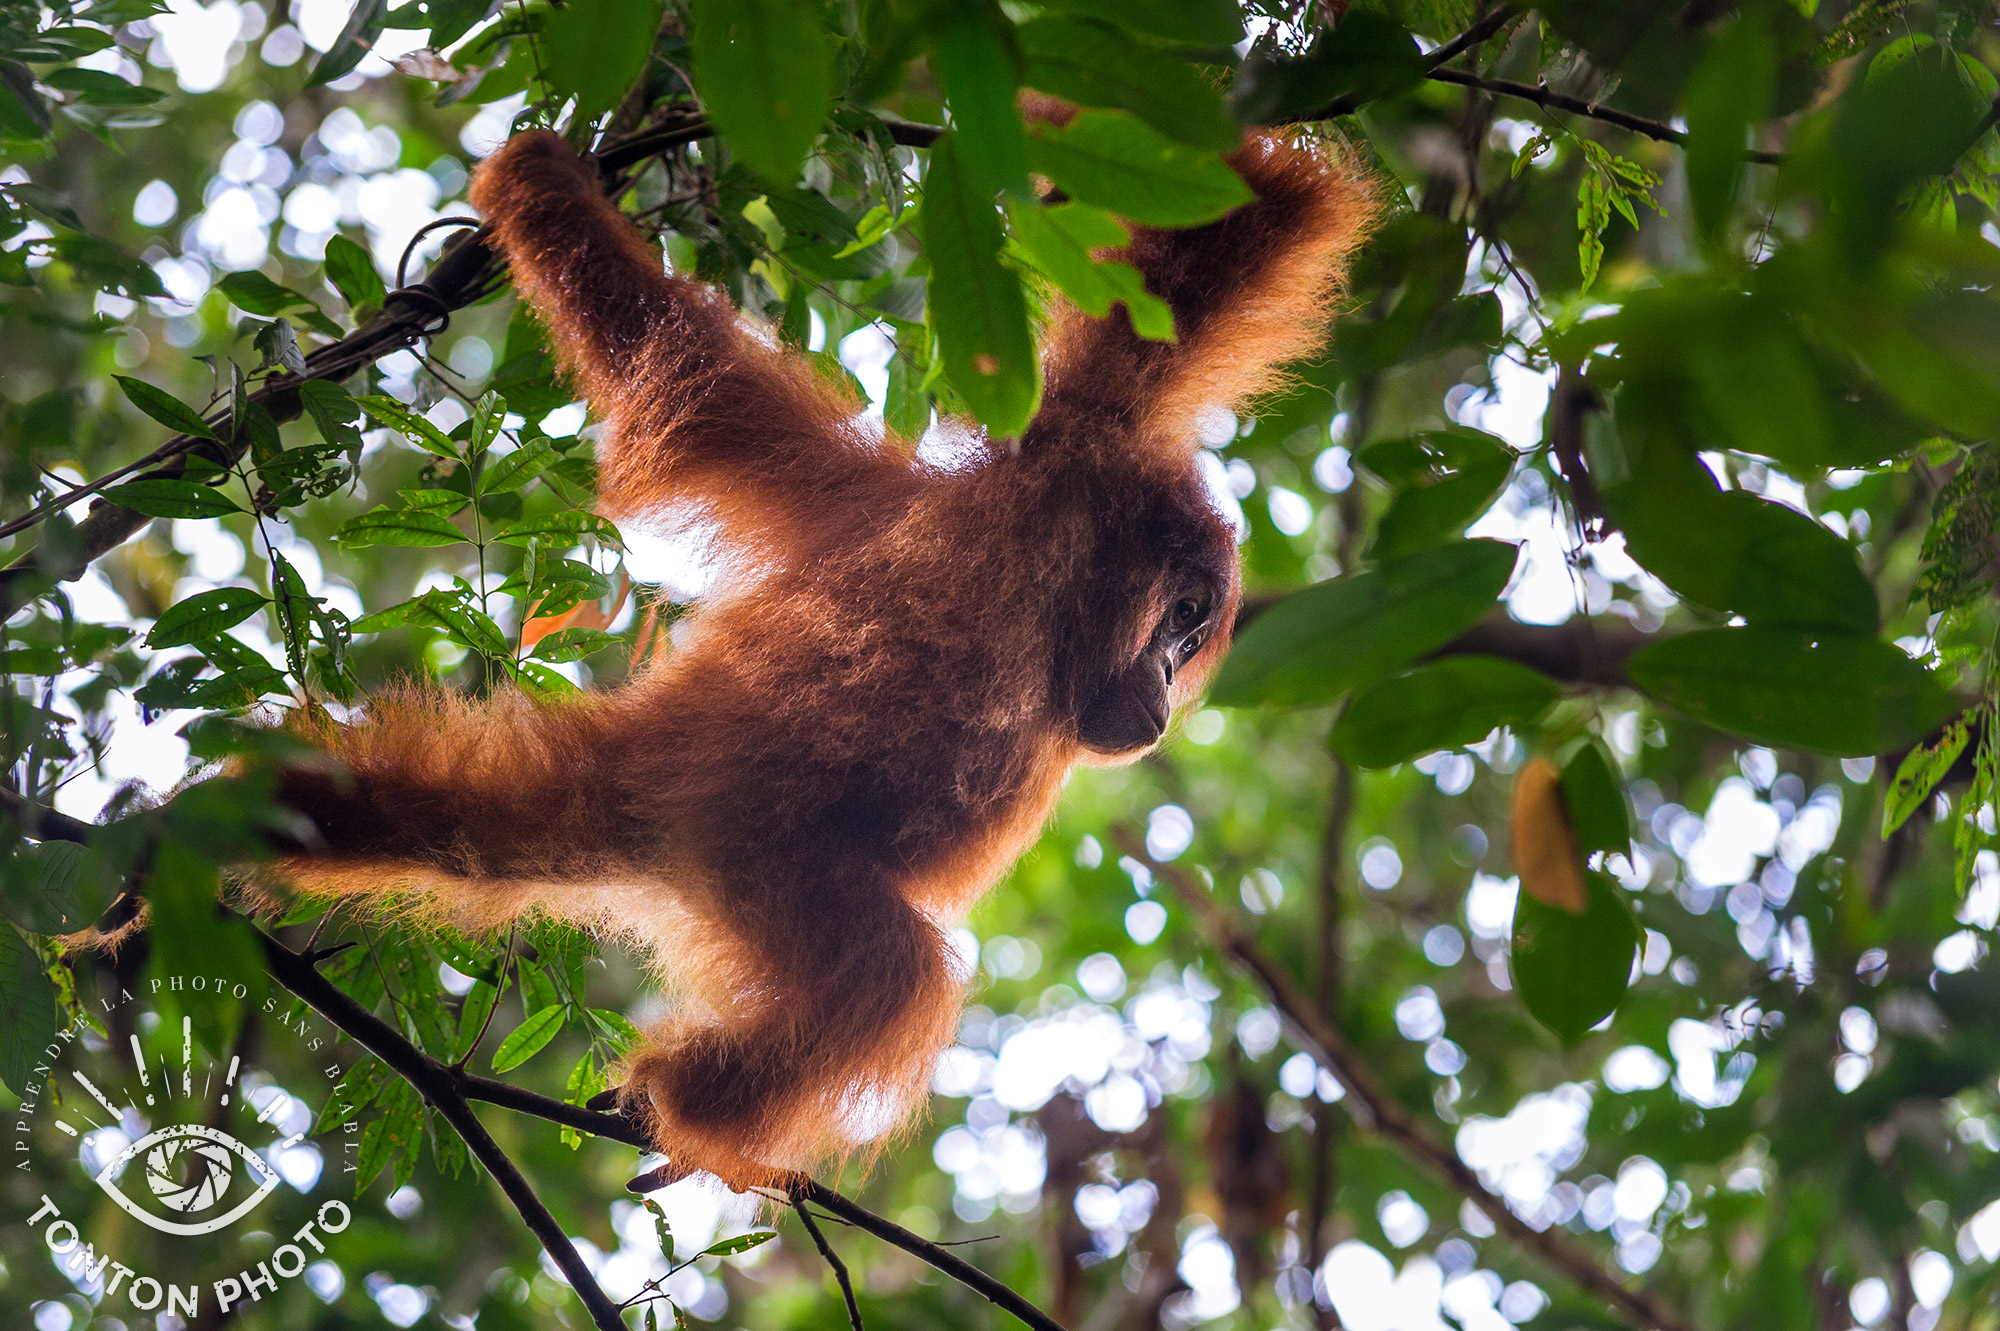 Photo animalière : Jeune orang-outan dans le Parc National de Gunung Leuser, Sumatra, Indonésie © Clément Racineux / Tonton Photo